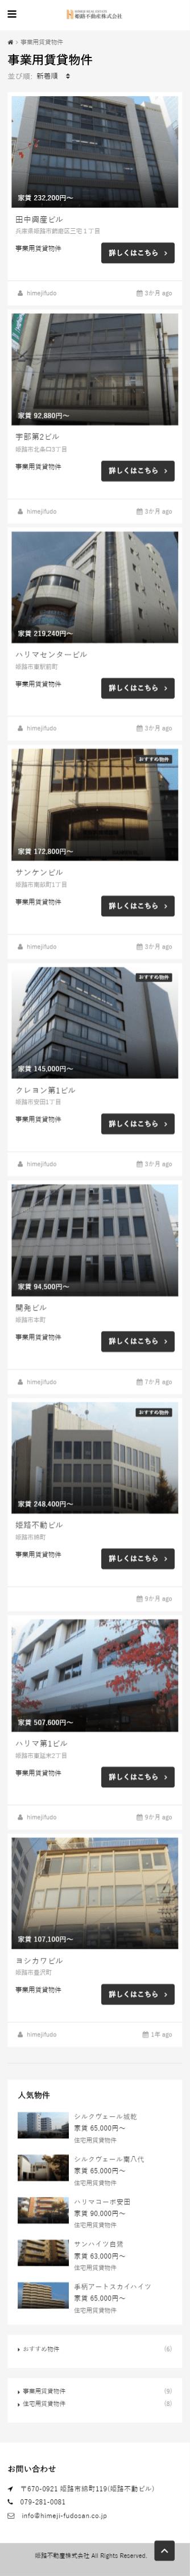 姫路市 姫路不動産株式会社様 ホームページ制作4